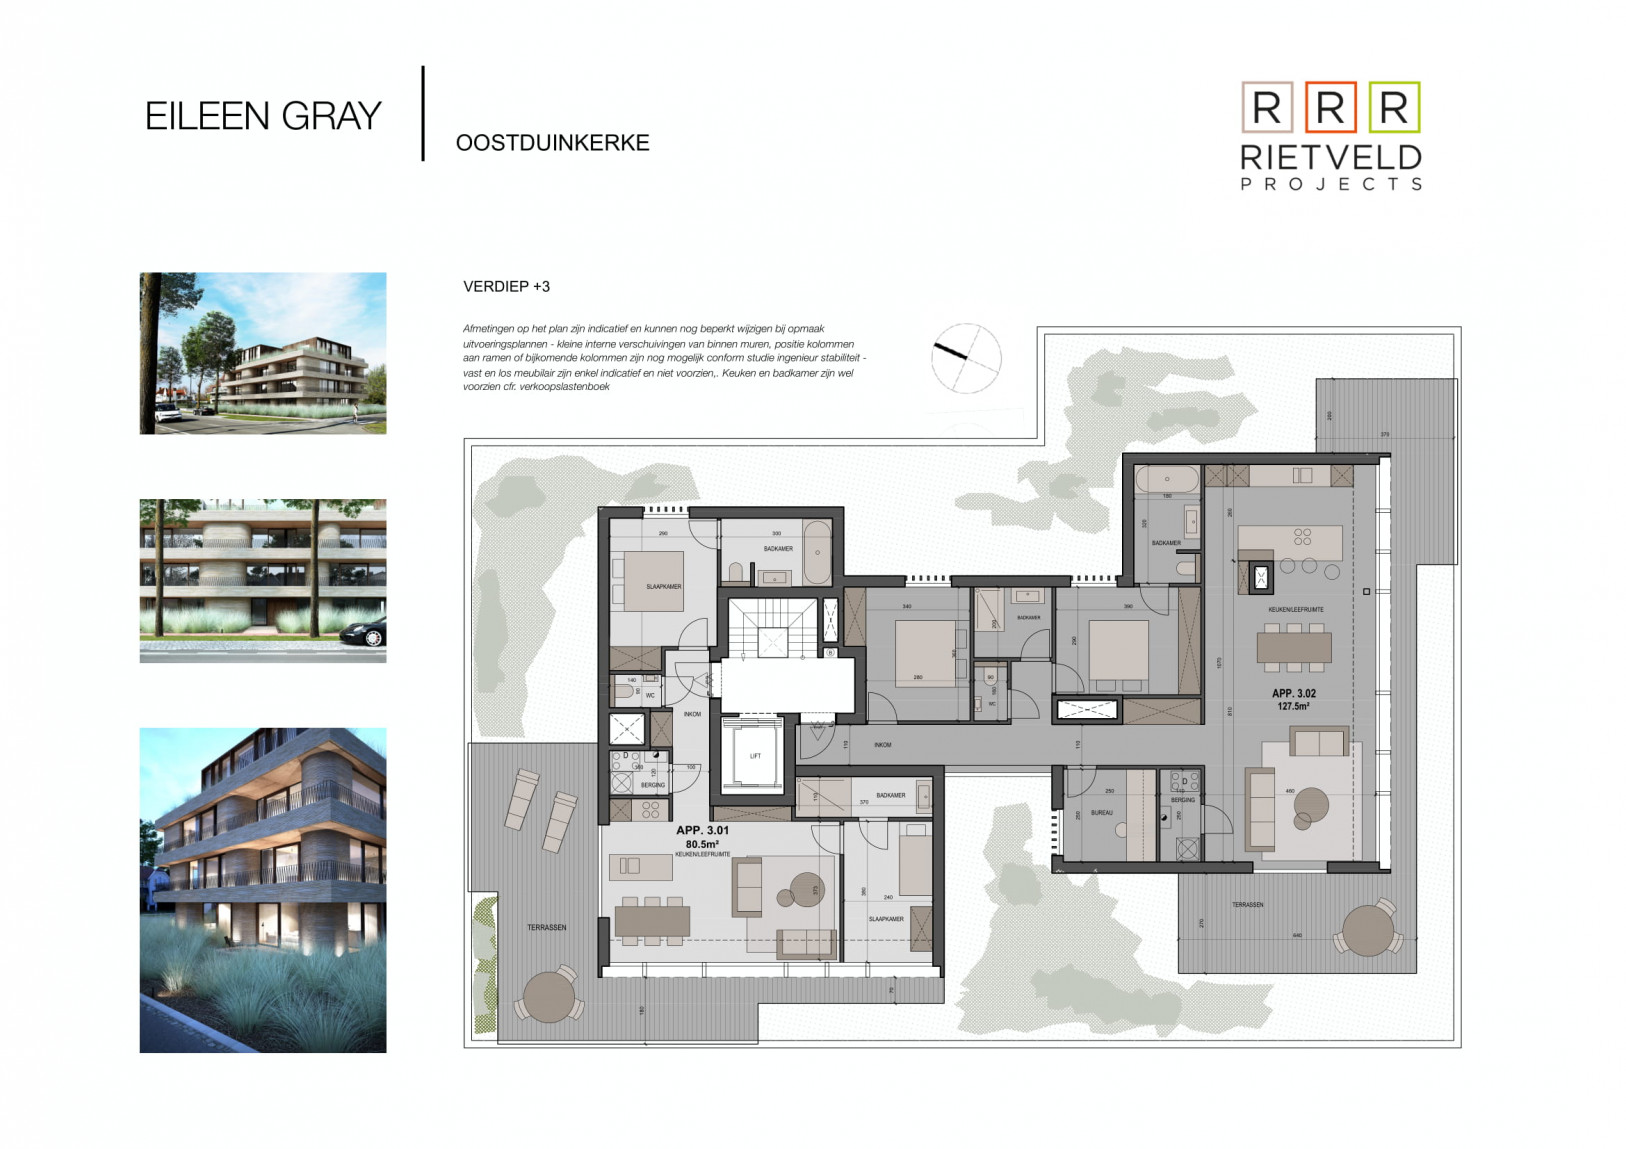 Eileen Gray - Rietveld Projects - Verdiepig 3